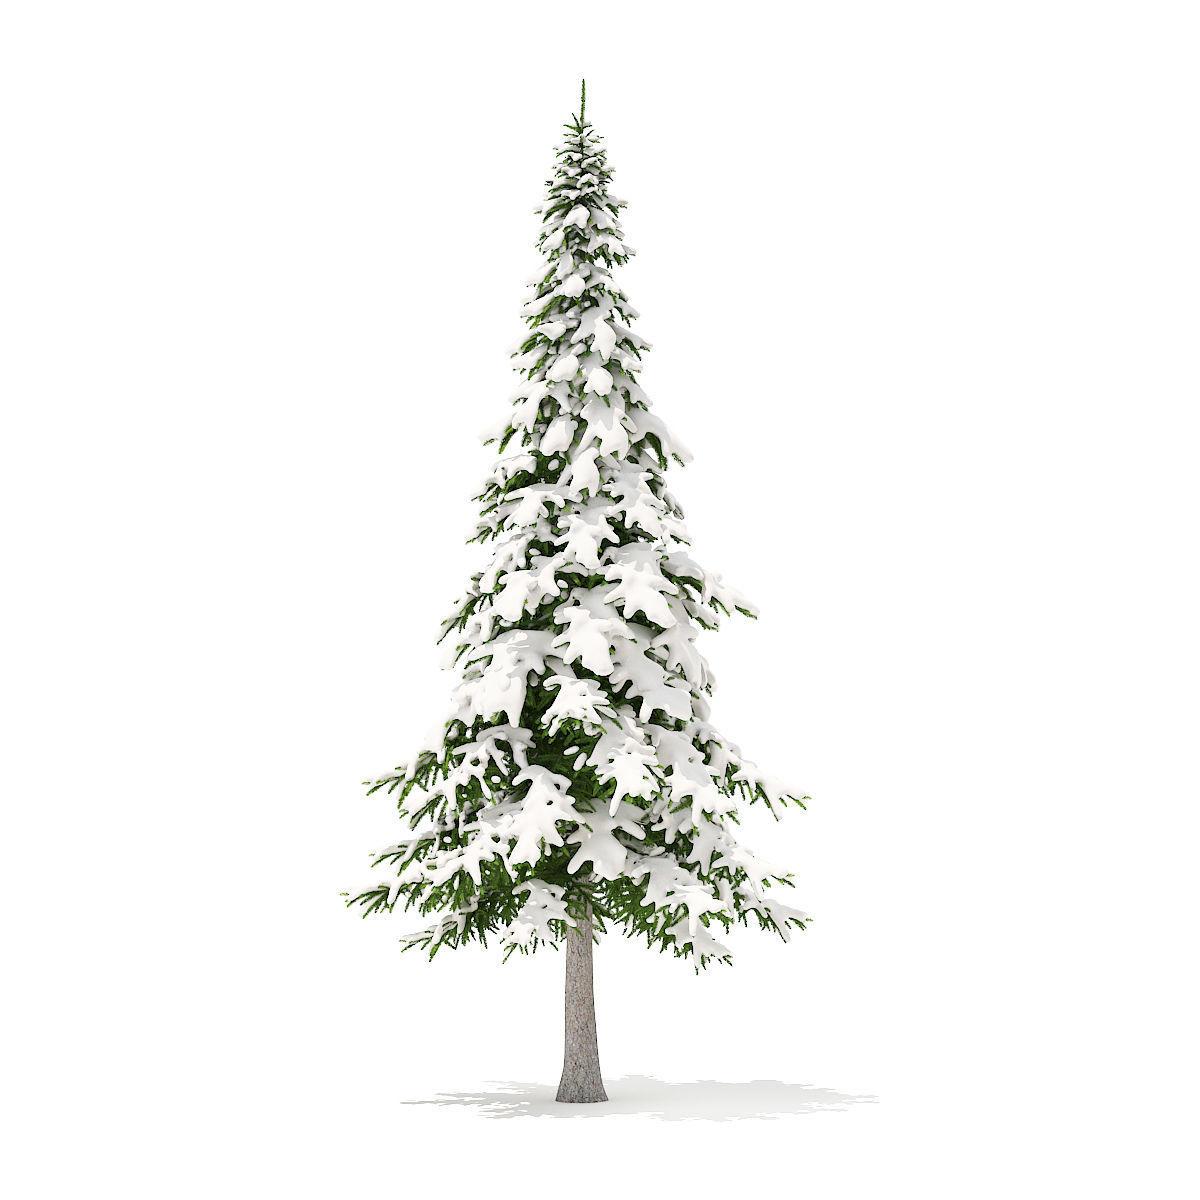 Fir Tree with Snow 7m